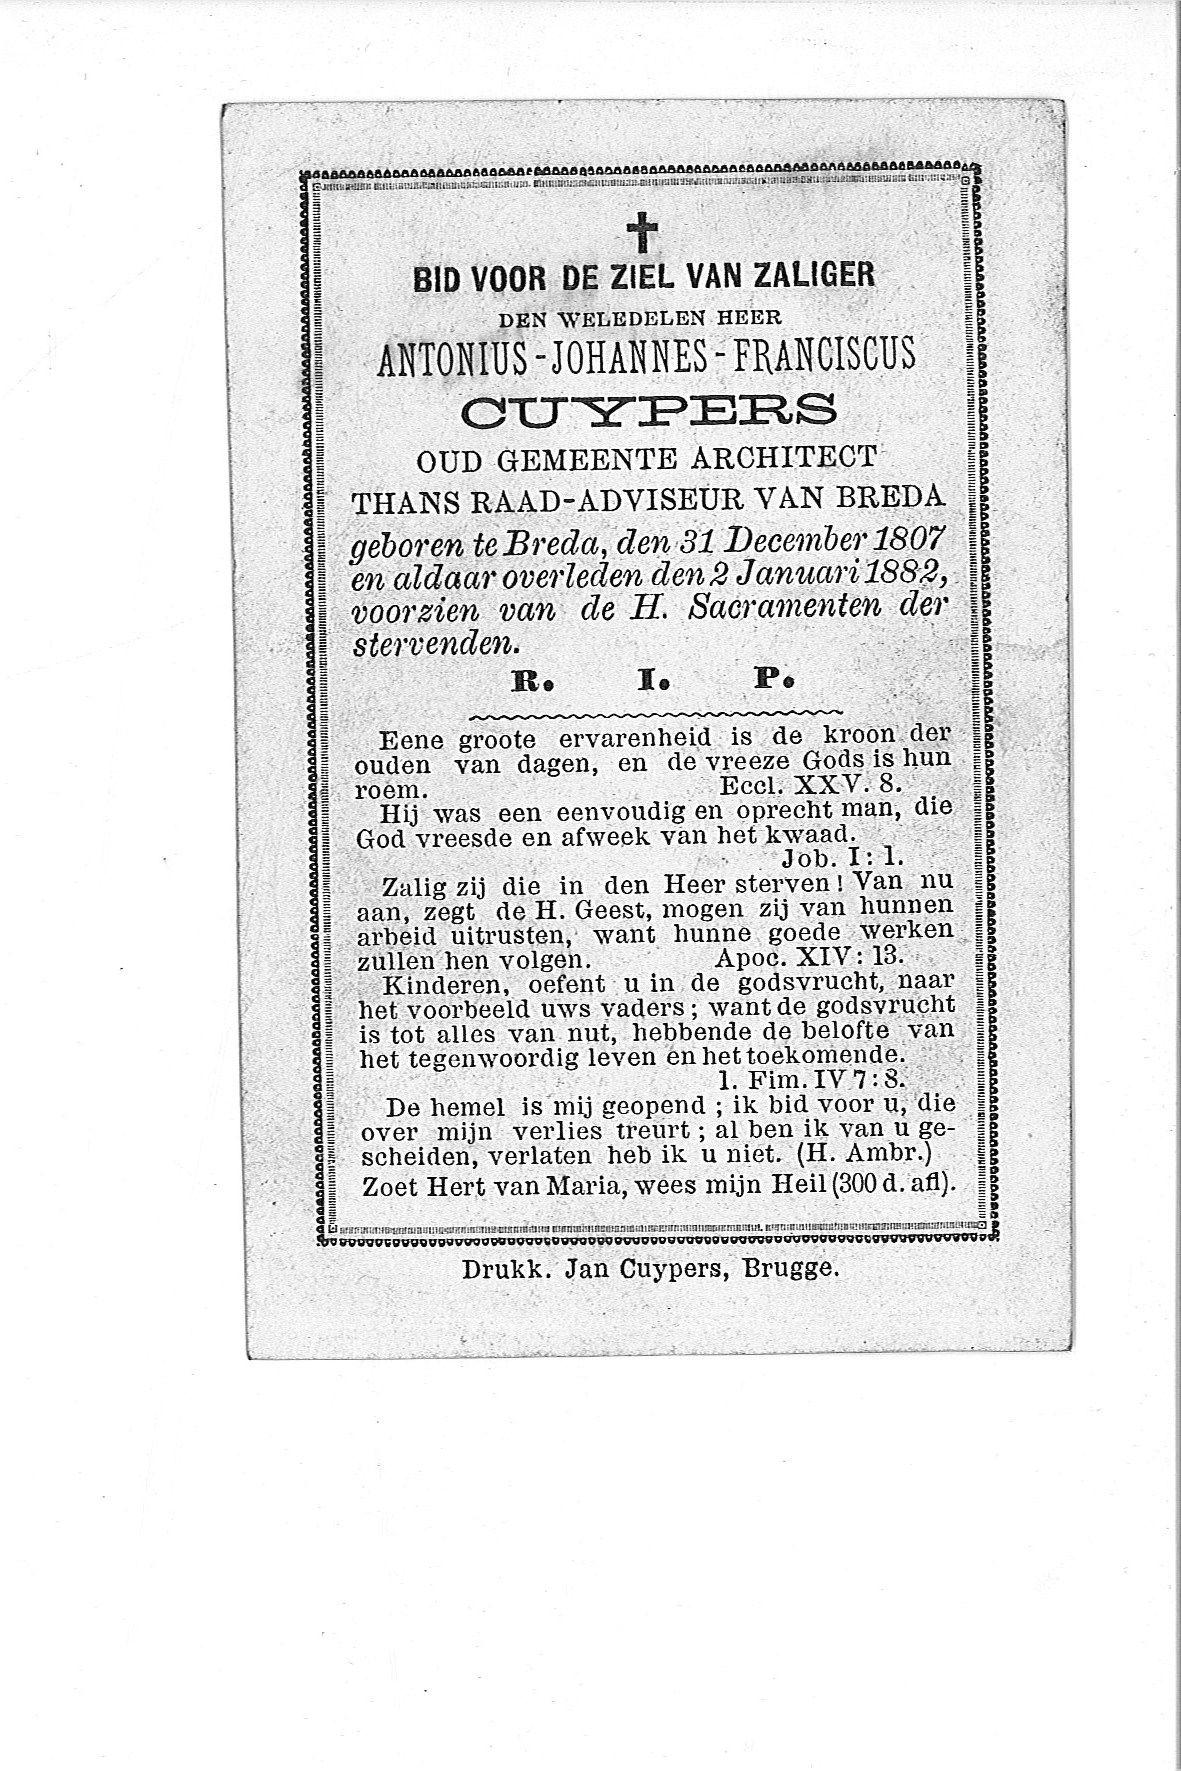 antonius-johannes-franciscus(1882)20090323101150_00035.jpg